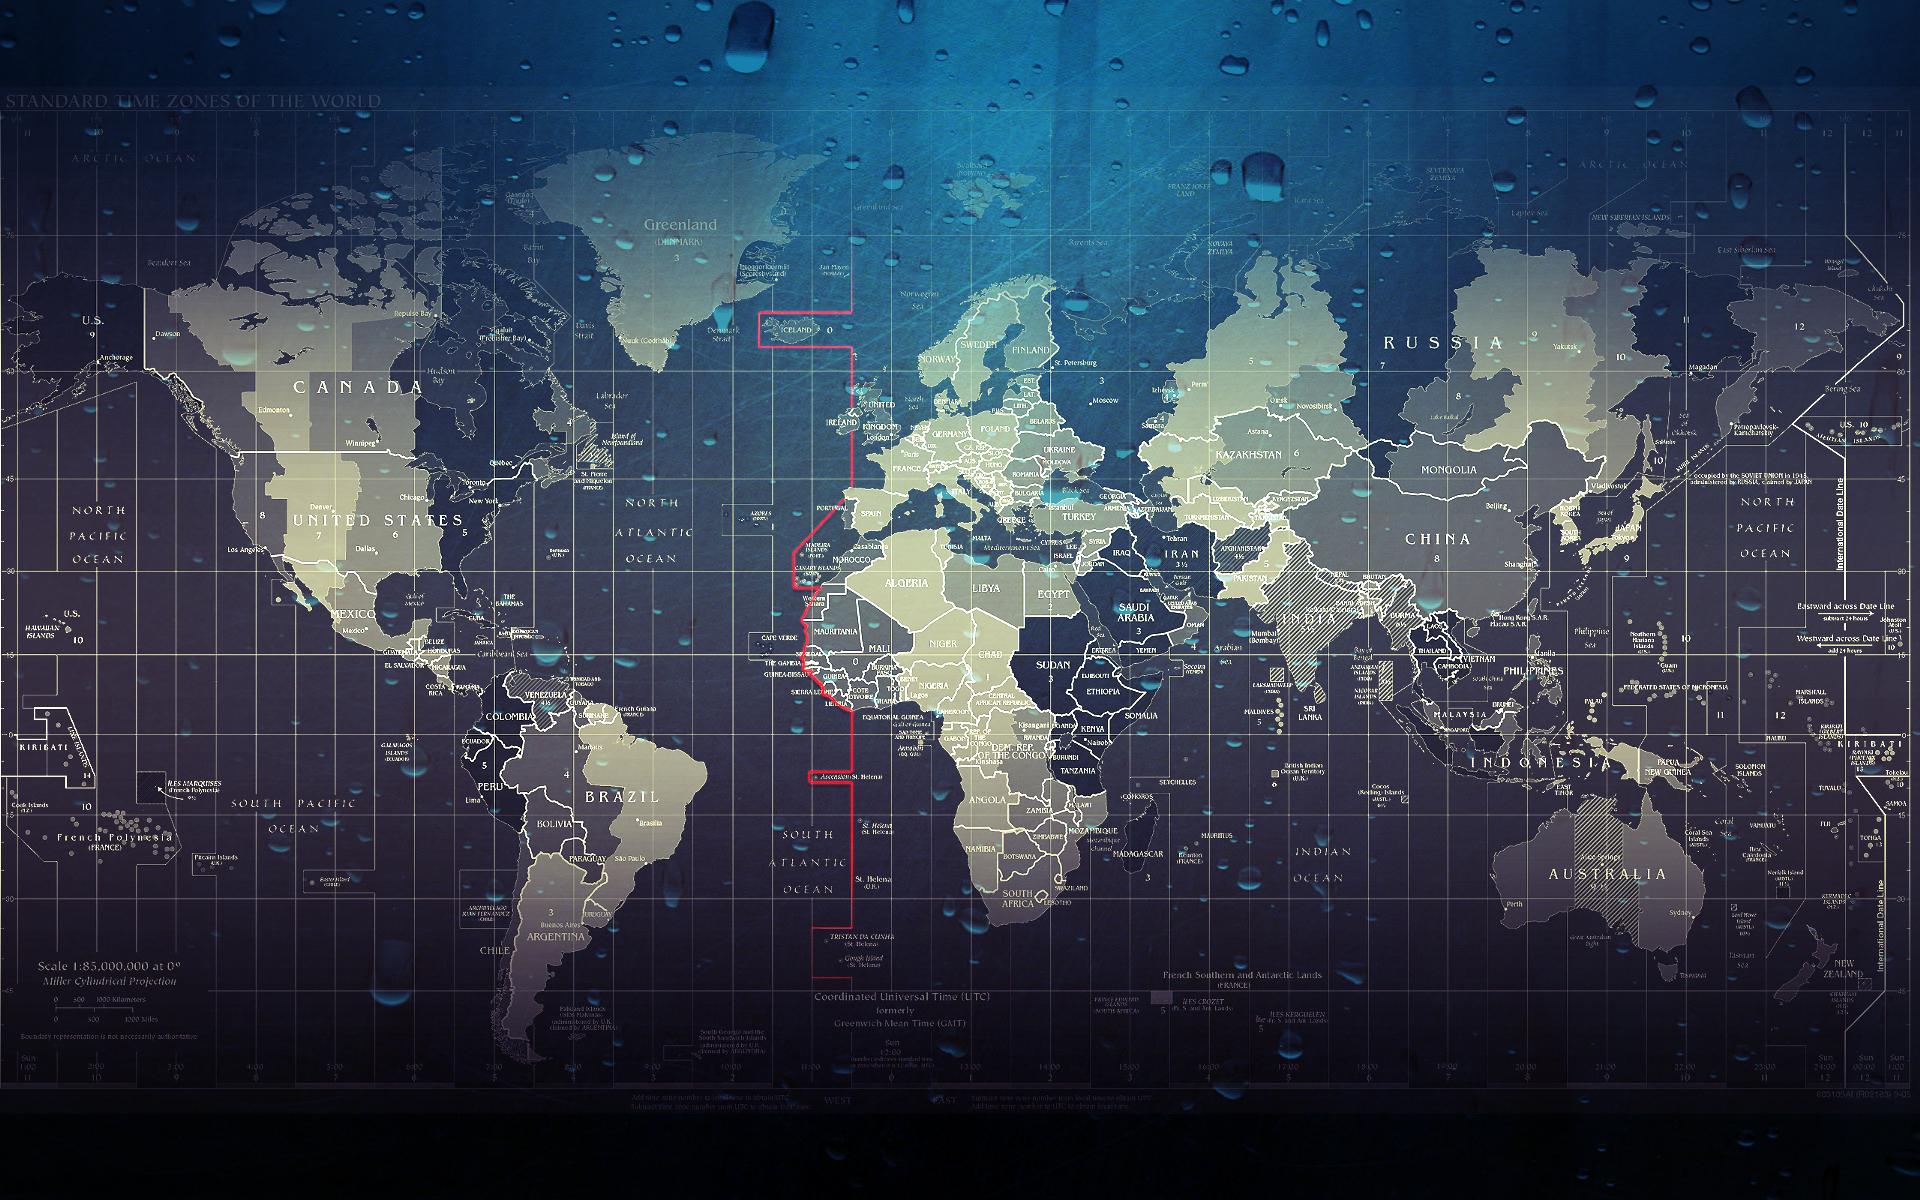 Wet maps water drops world map wallpaper background 1920x1200